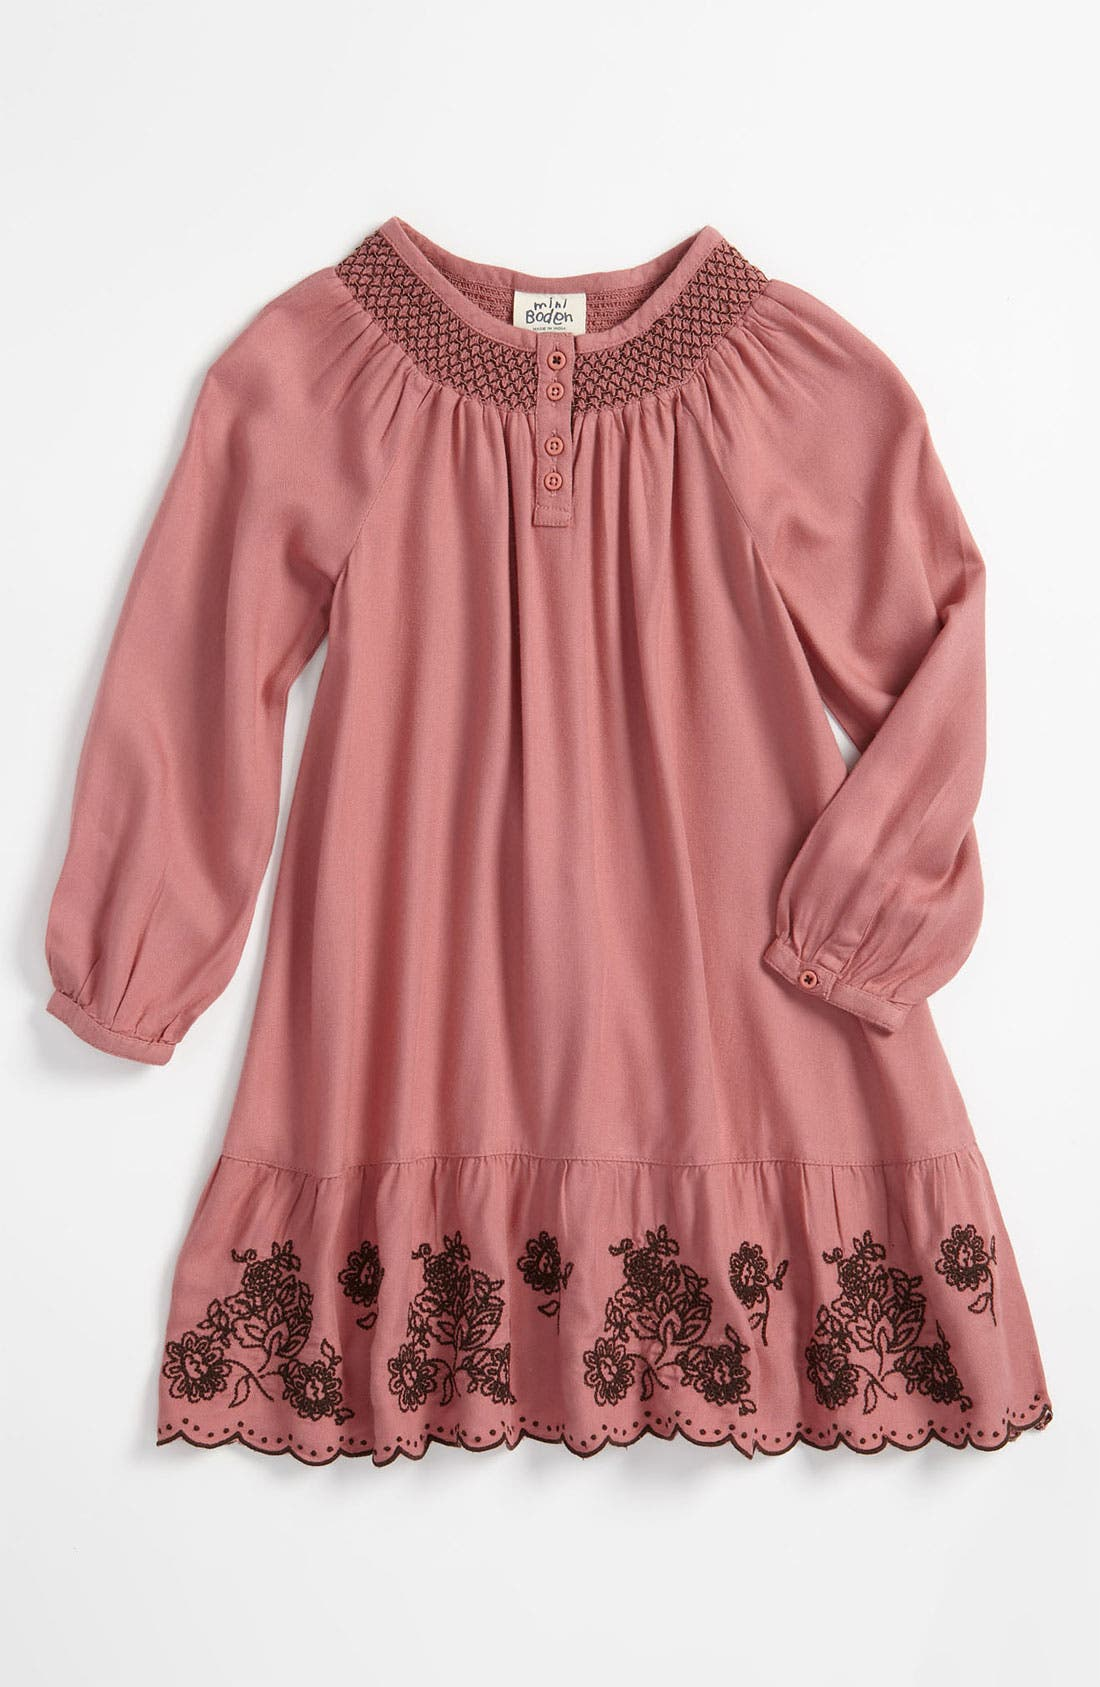 Alternate Image 1 Selected - Mini Boden Embroidered Hem Dress (Toddler)